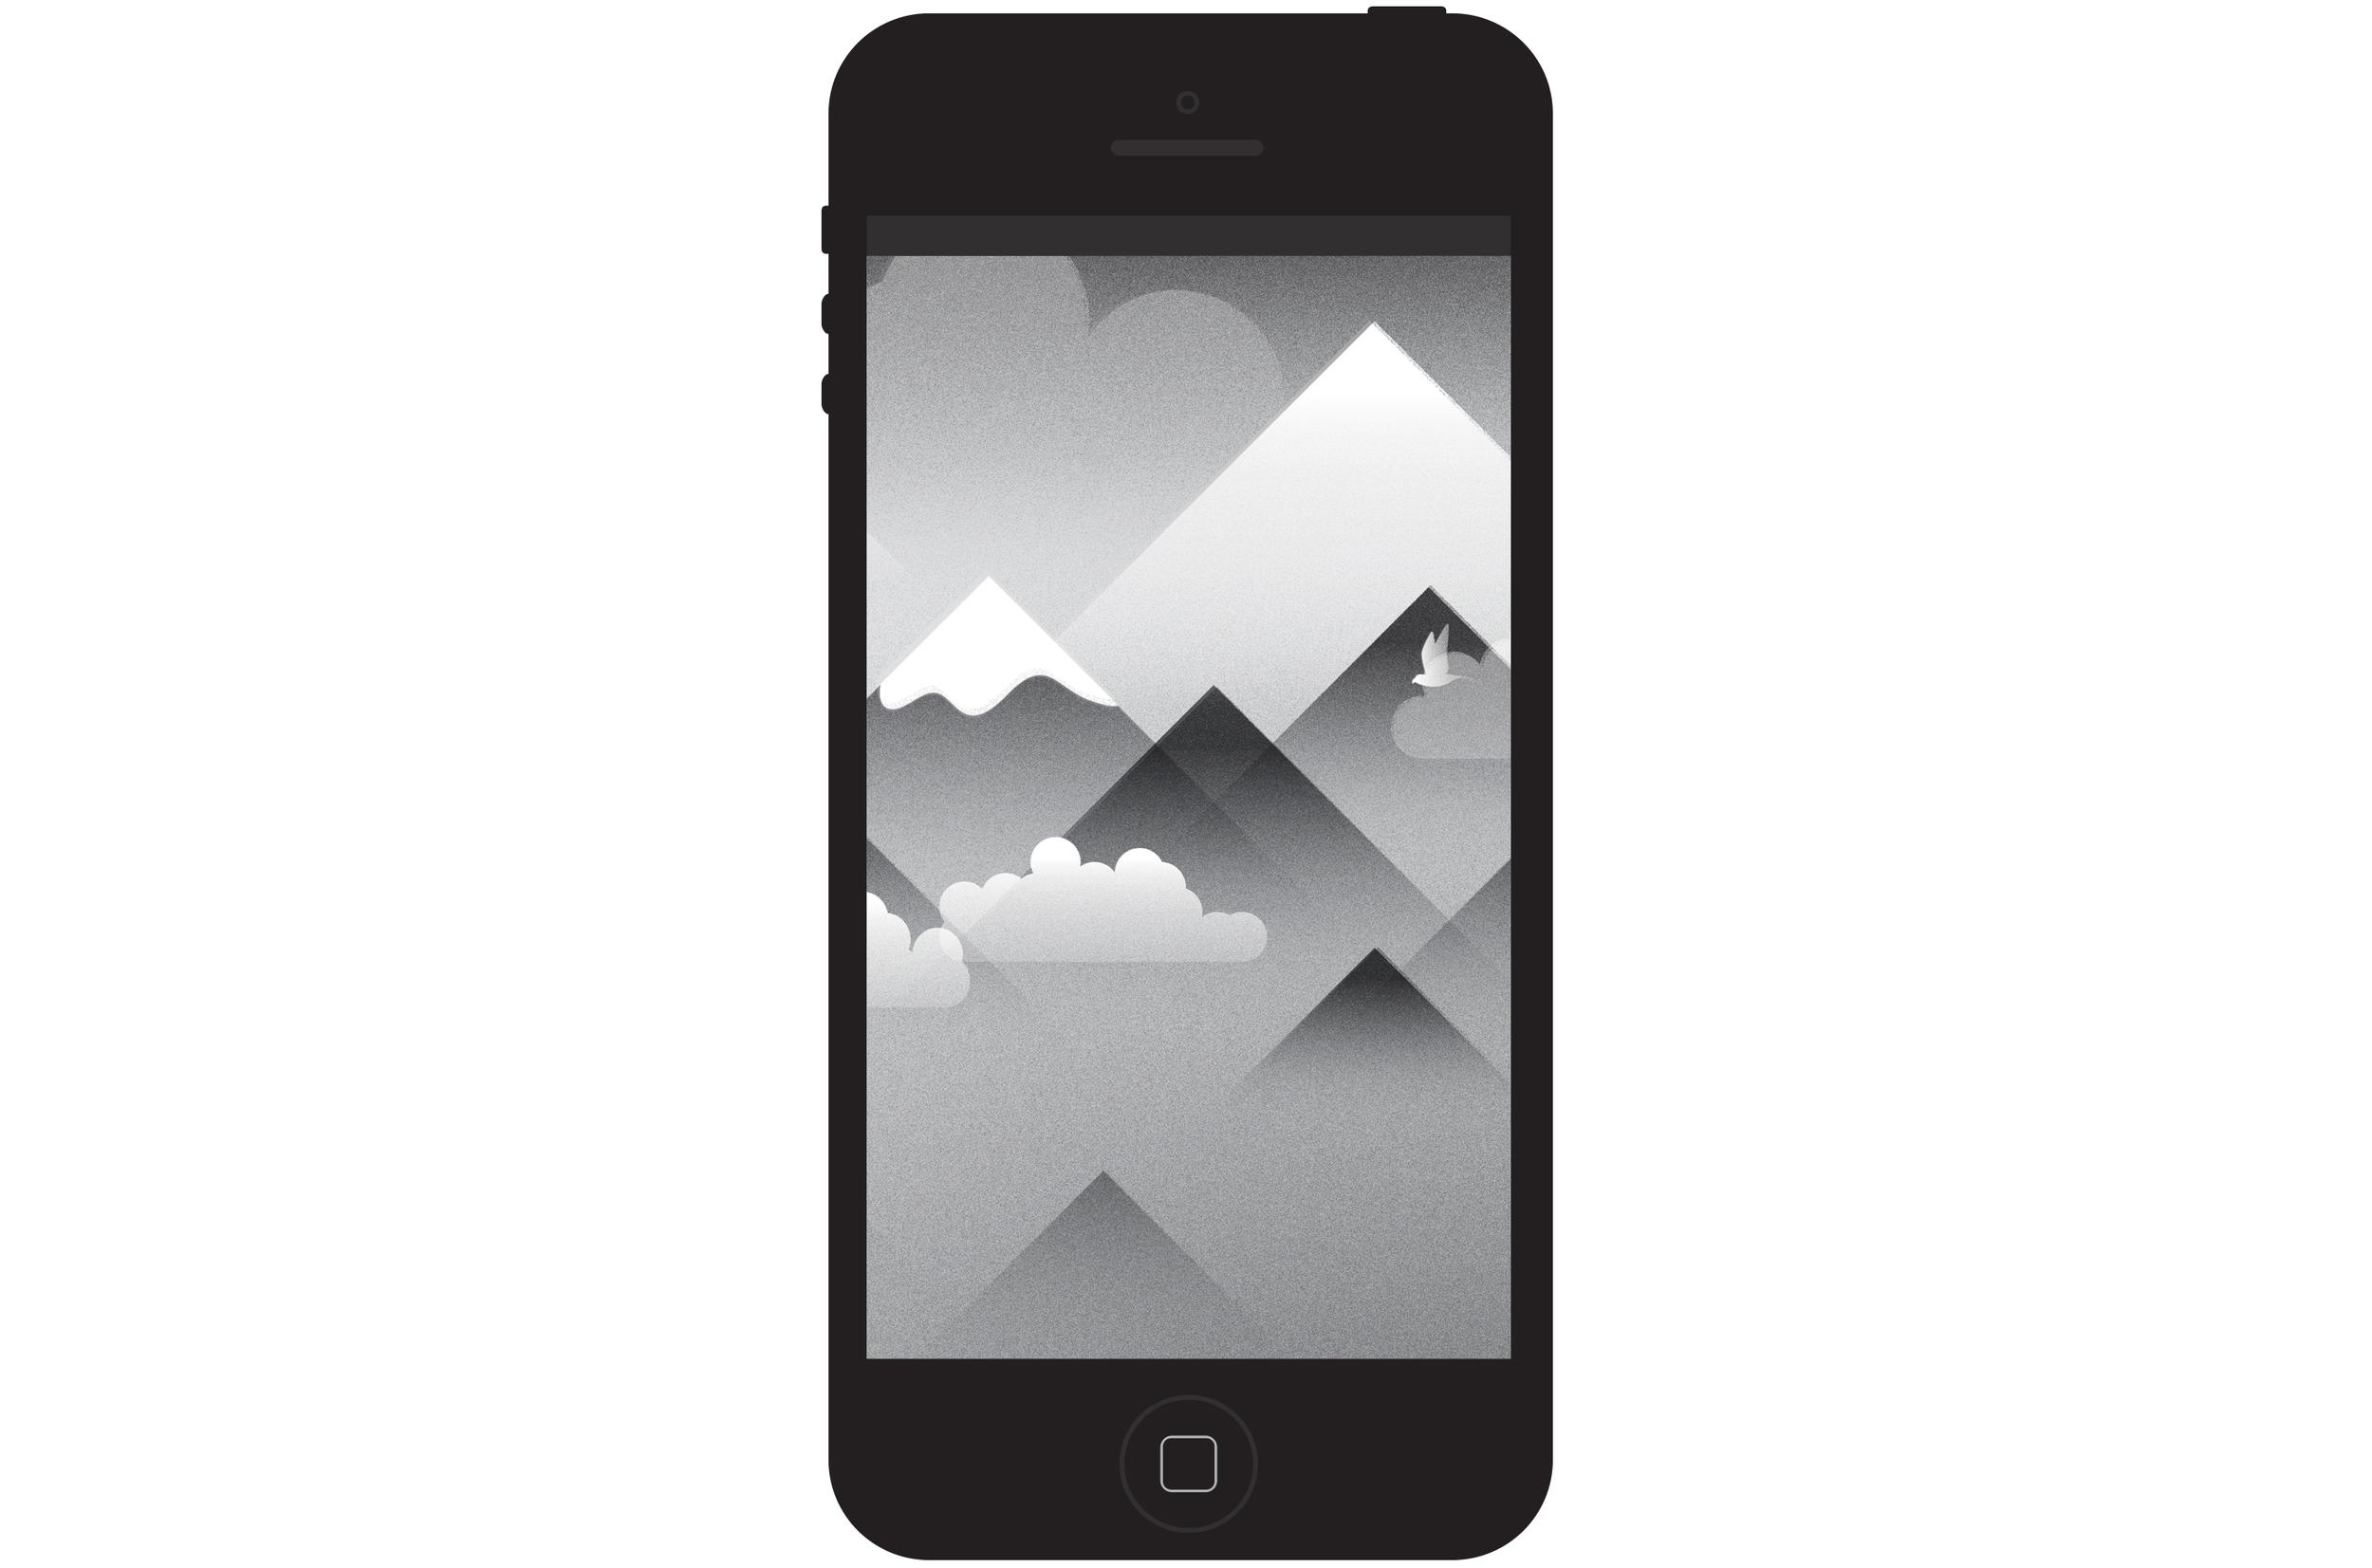 Cleartones_Classic_iPhone.jpg